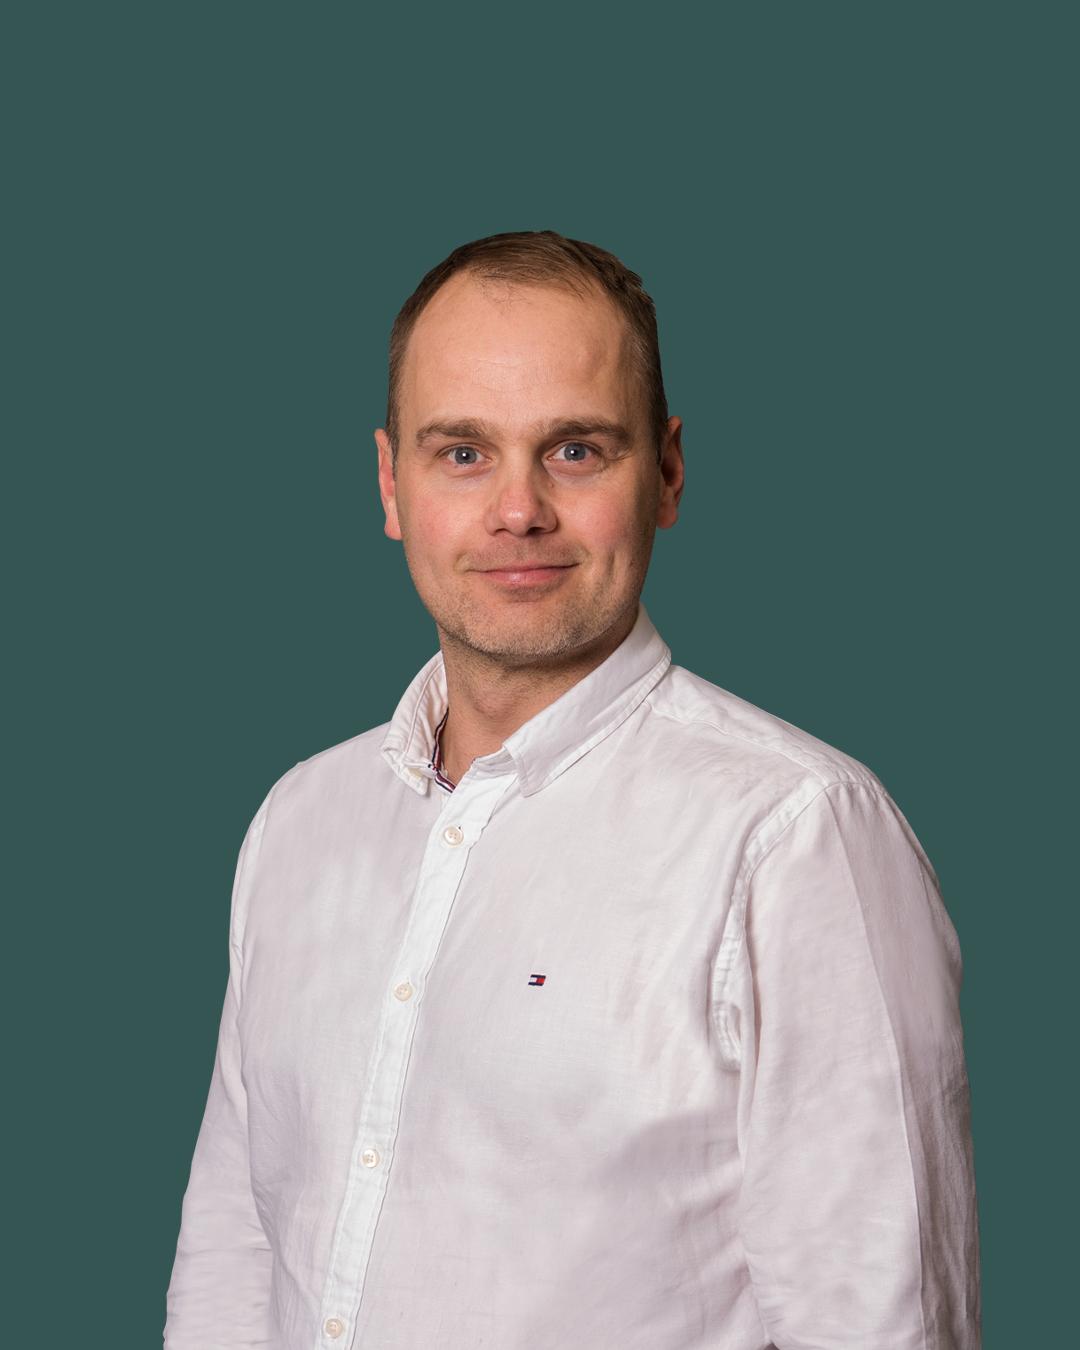 Johan Nilsson